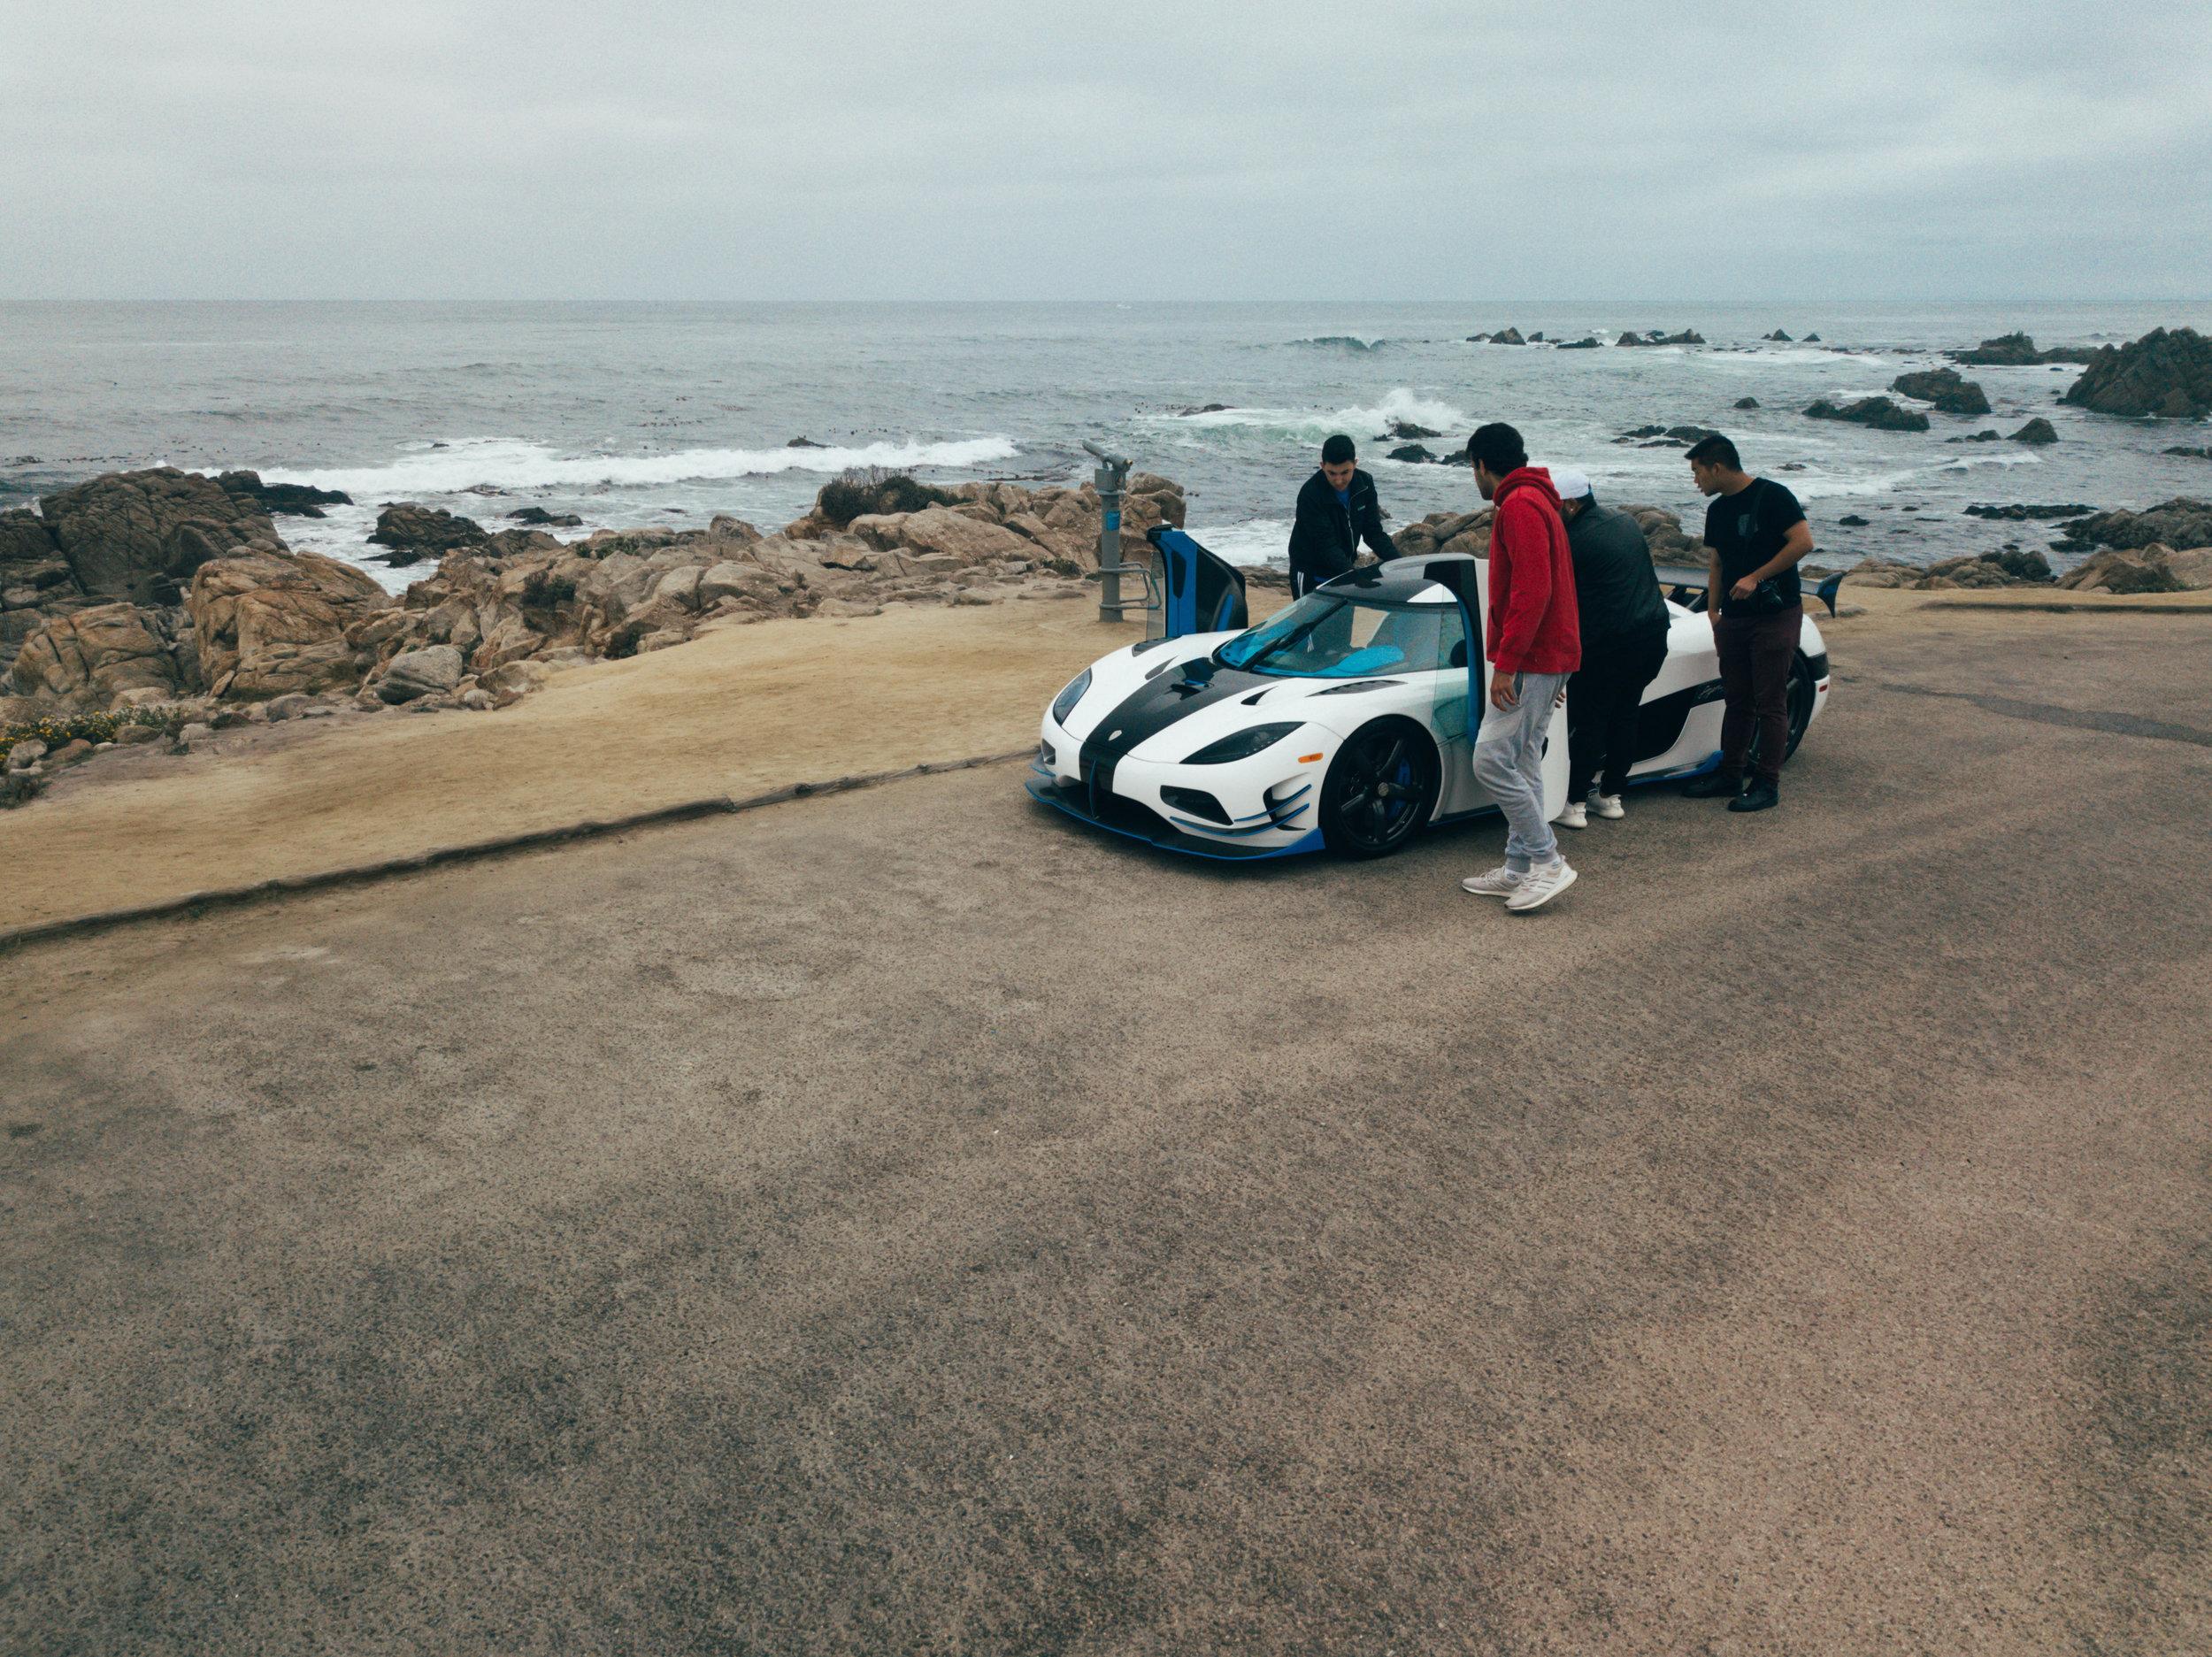 Stay_Driven_Monterey_Car_Week_Whitesse_Koenigsegg-11.jpg